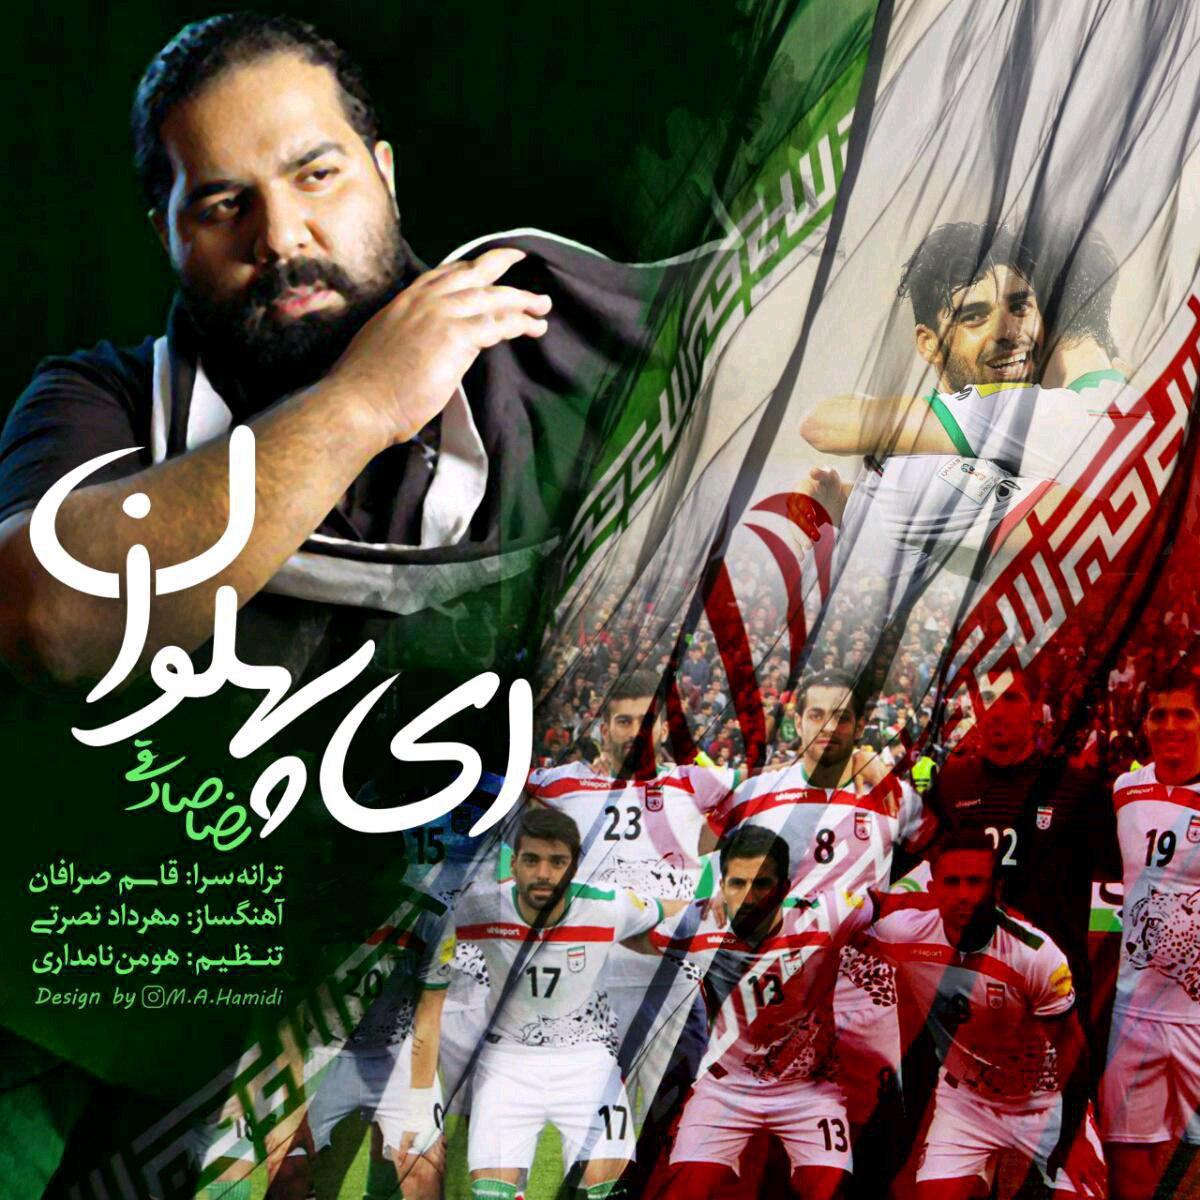 Reza Sadeghi – Ey Pahlevan